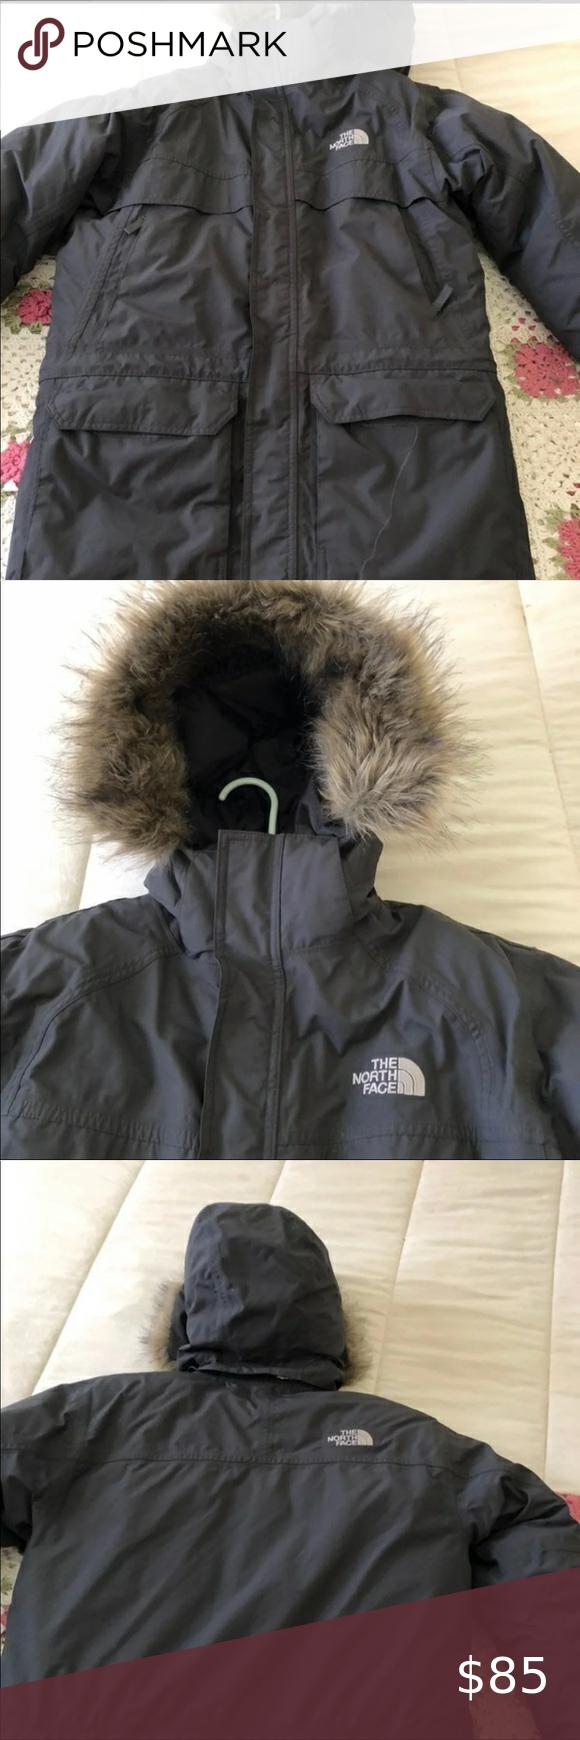 North Face Winter Coat North Face Winter Coat Winter Coat Winter Coat Warmest [ 1740 x 580 Pixel ]